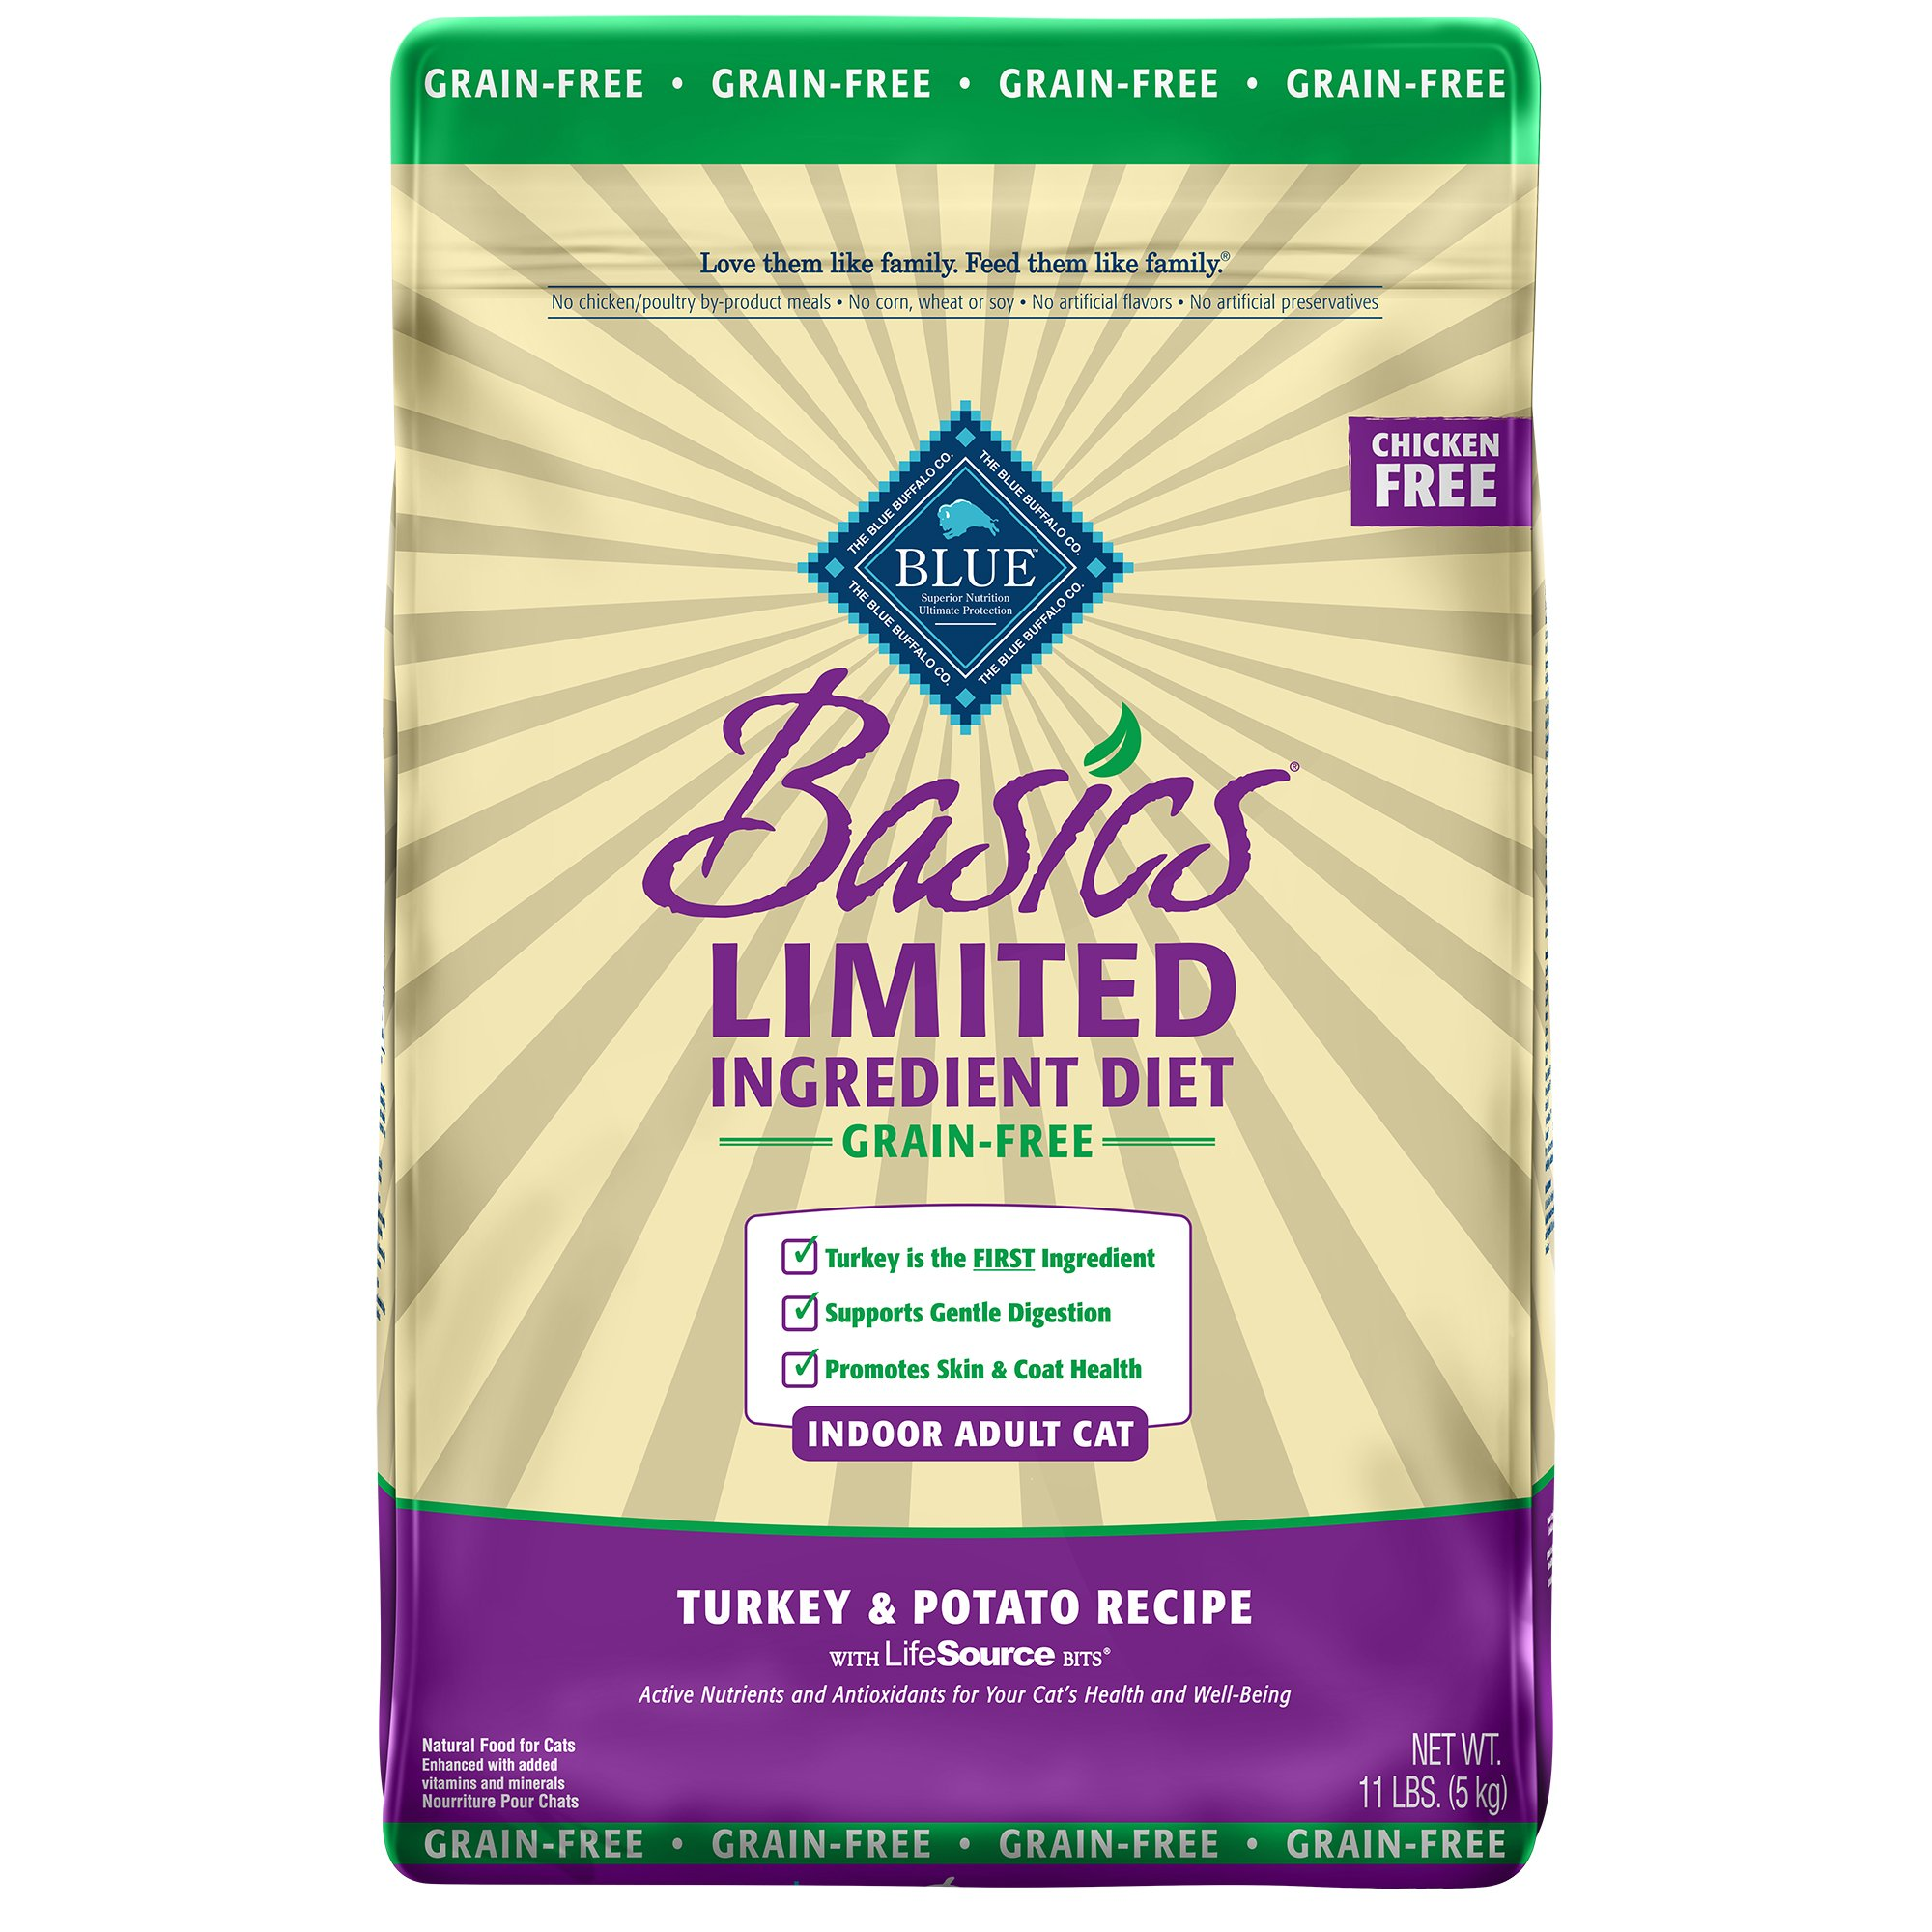 Blue Basics Grain Free Dog Food